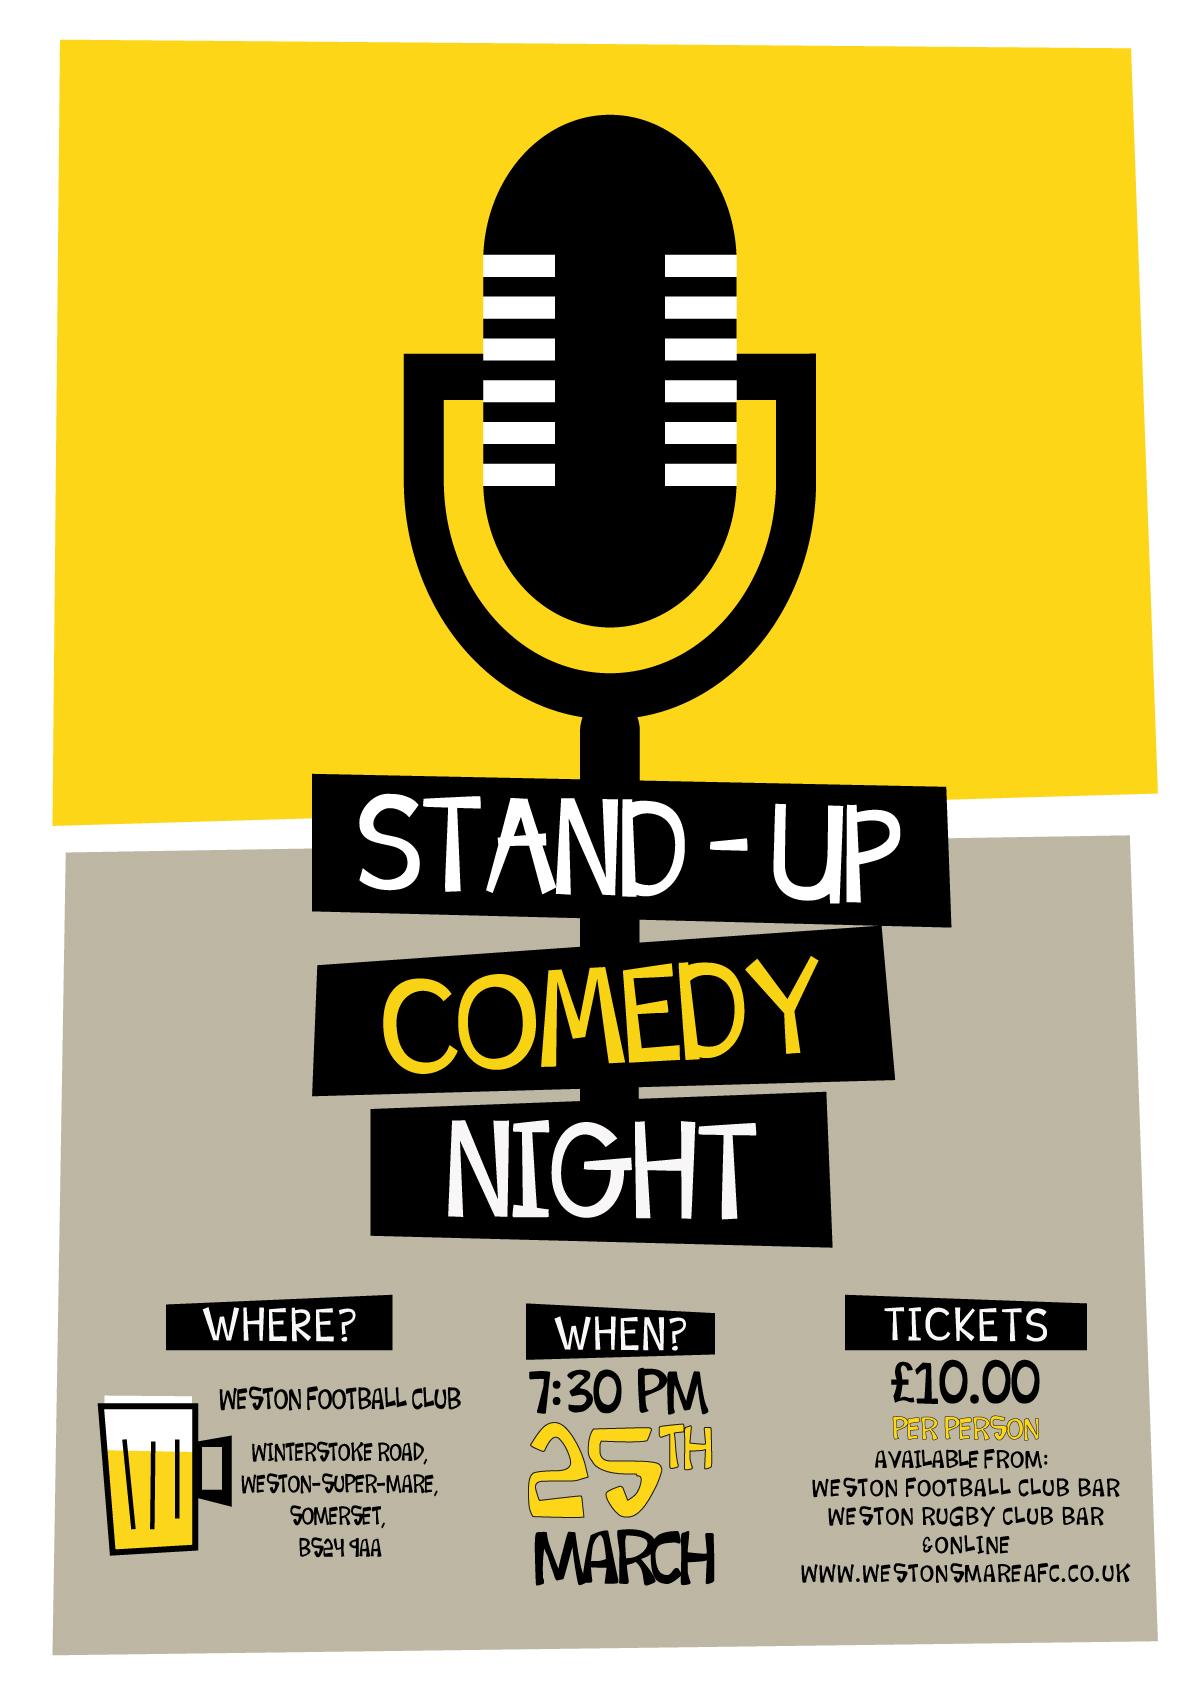 comedy-night-march-25